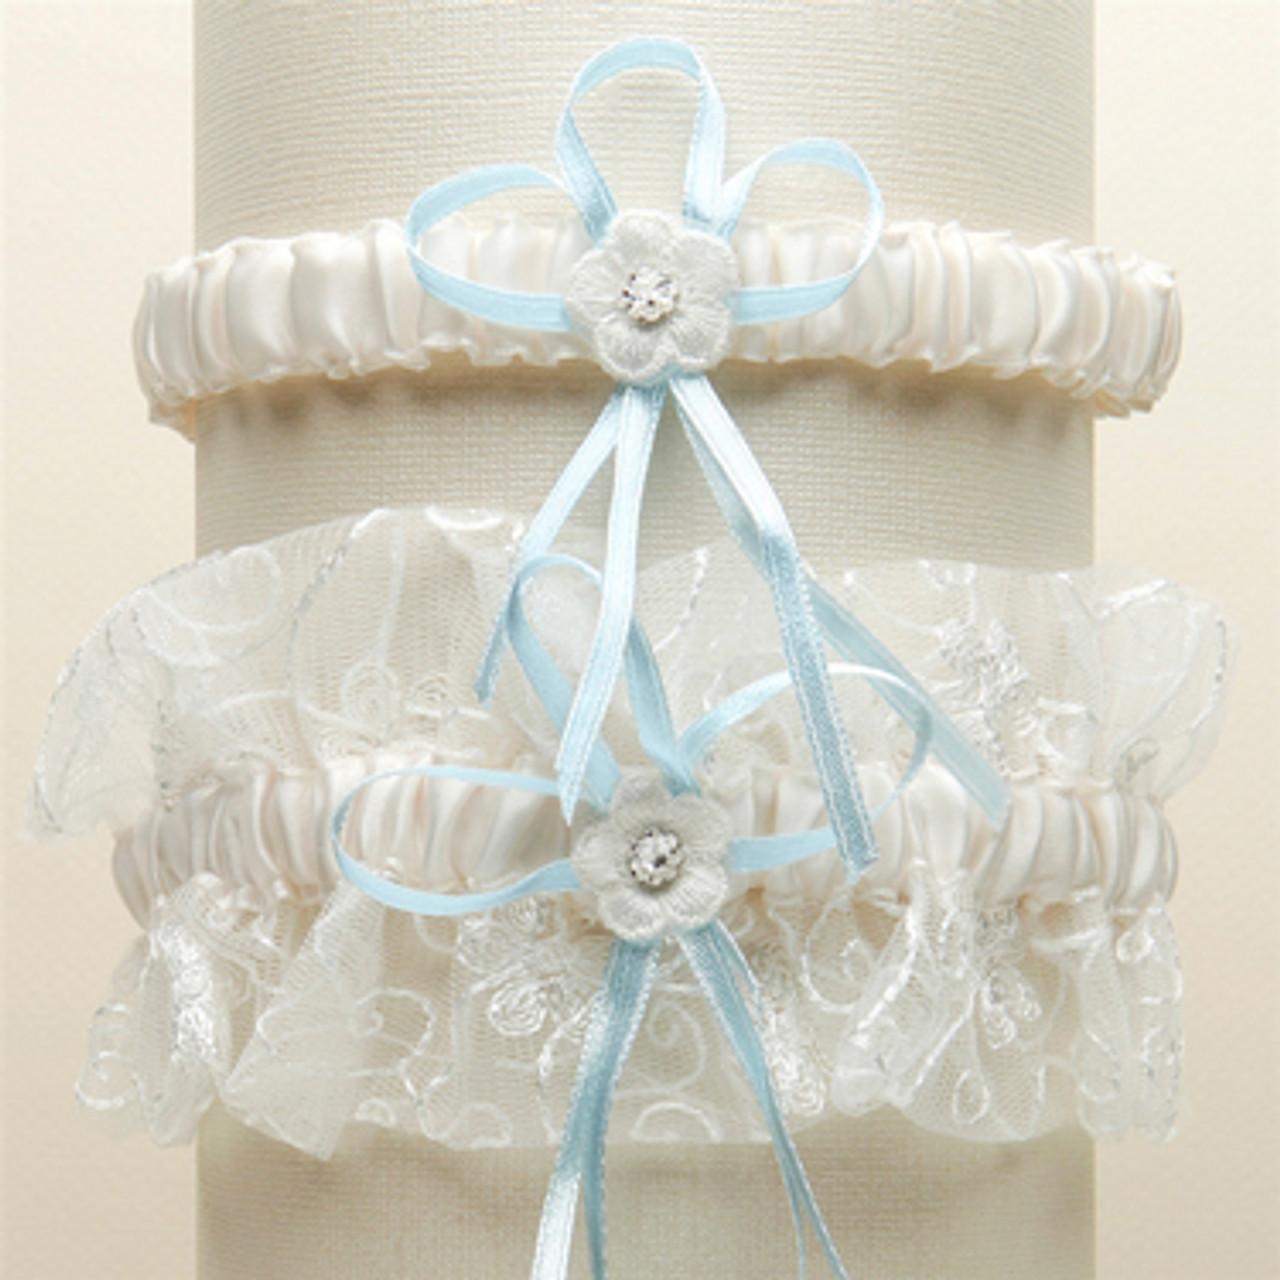 Vintage Wedding Garter Set With Floral Embroidered Tulle Ivory